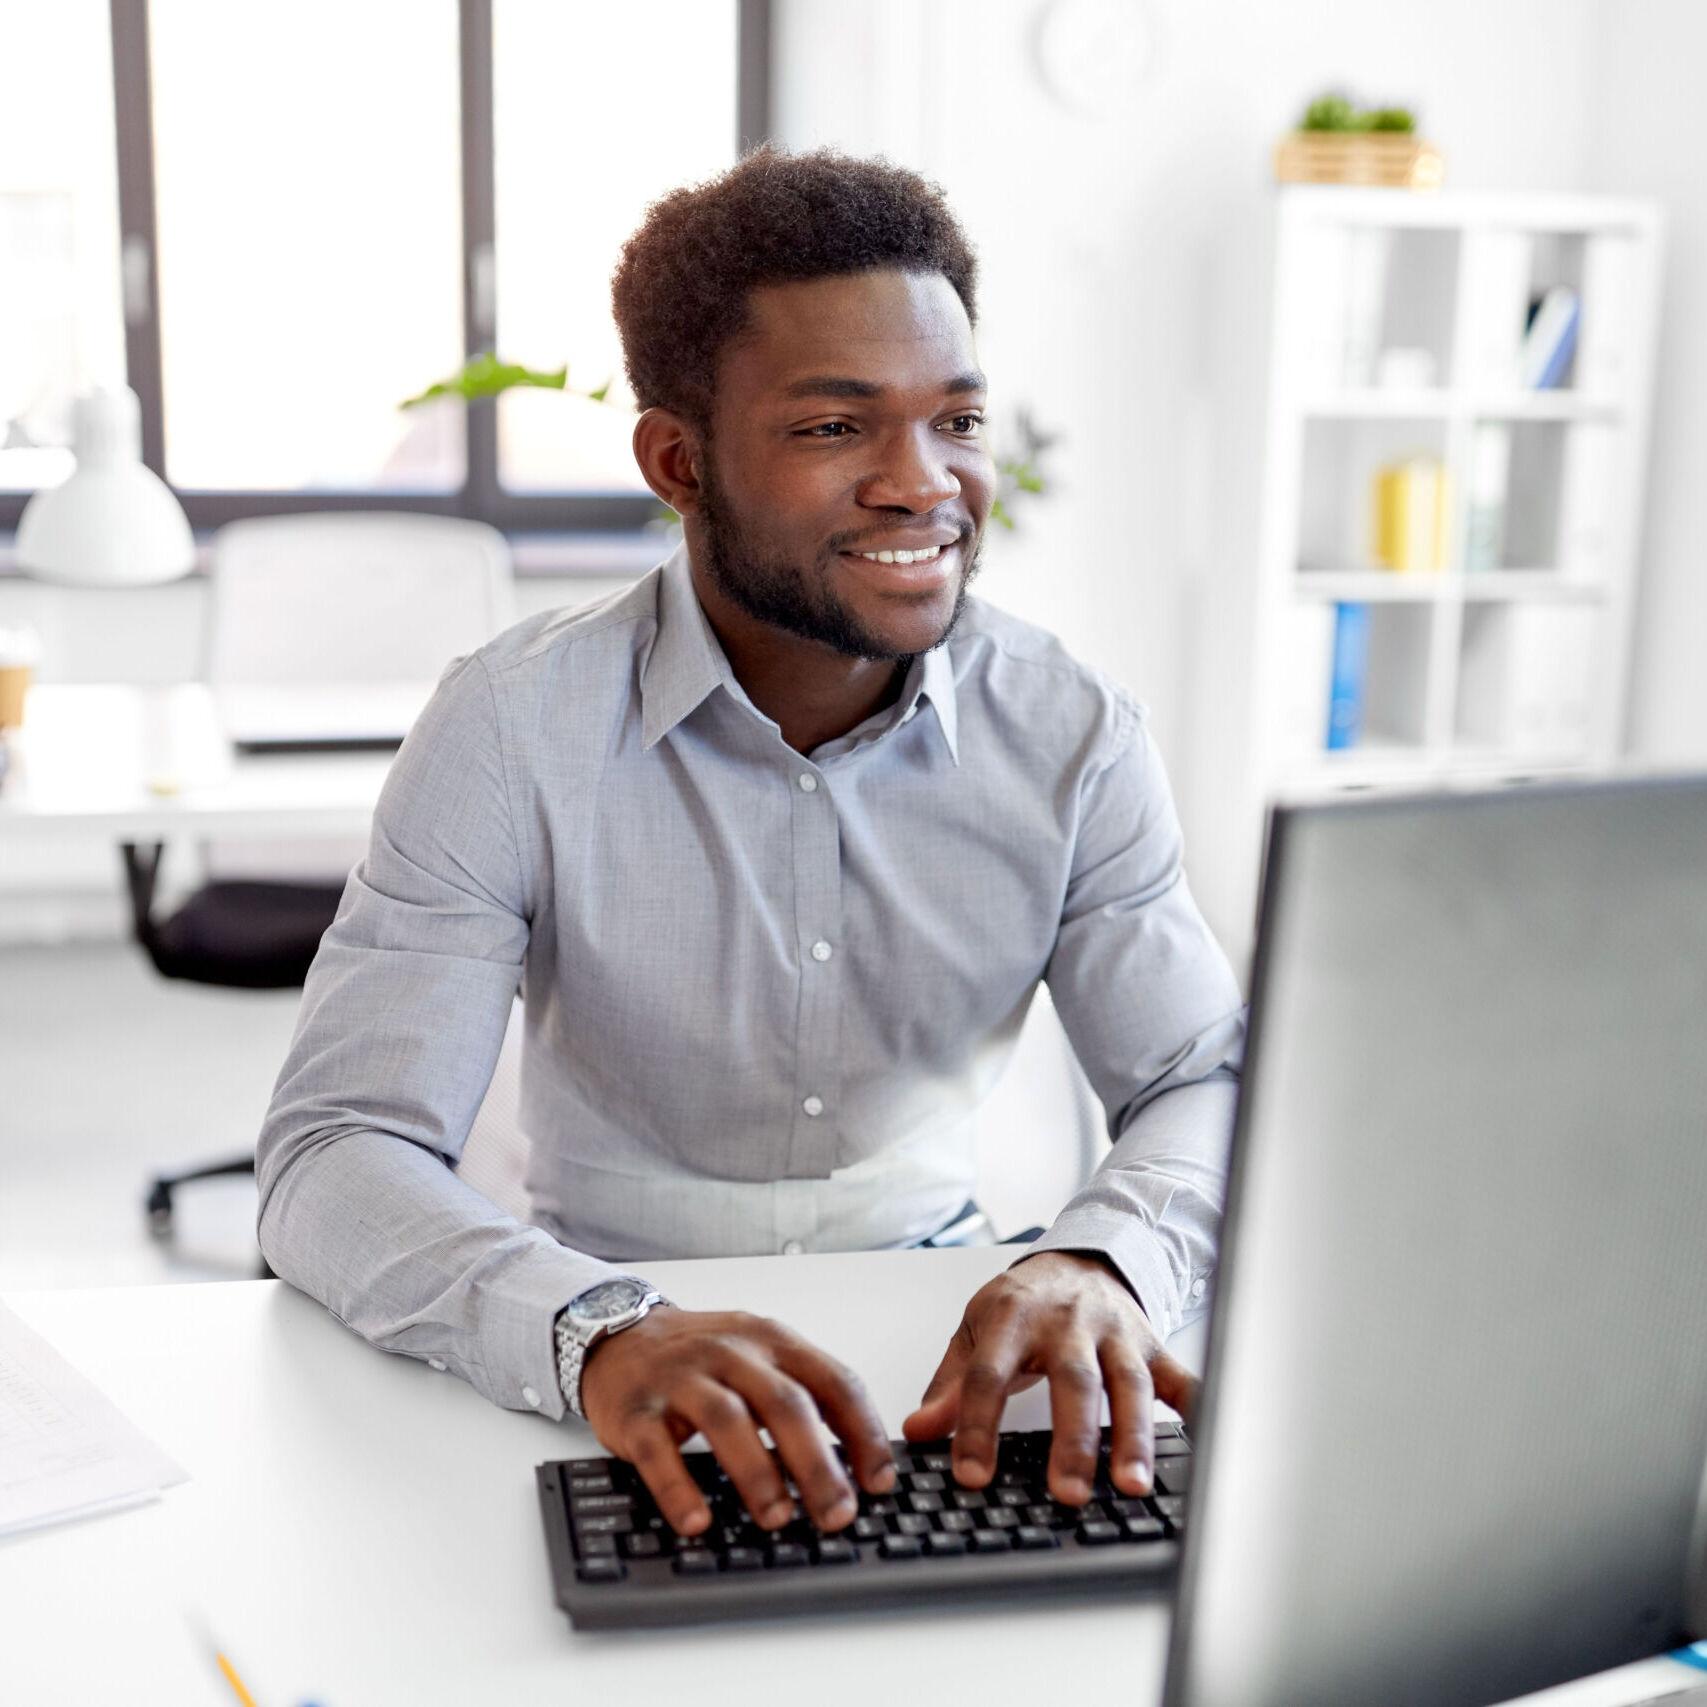 content-management-guy-at-laptop-